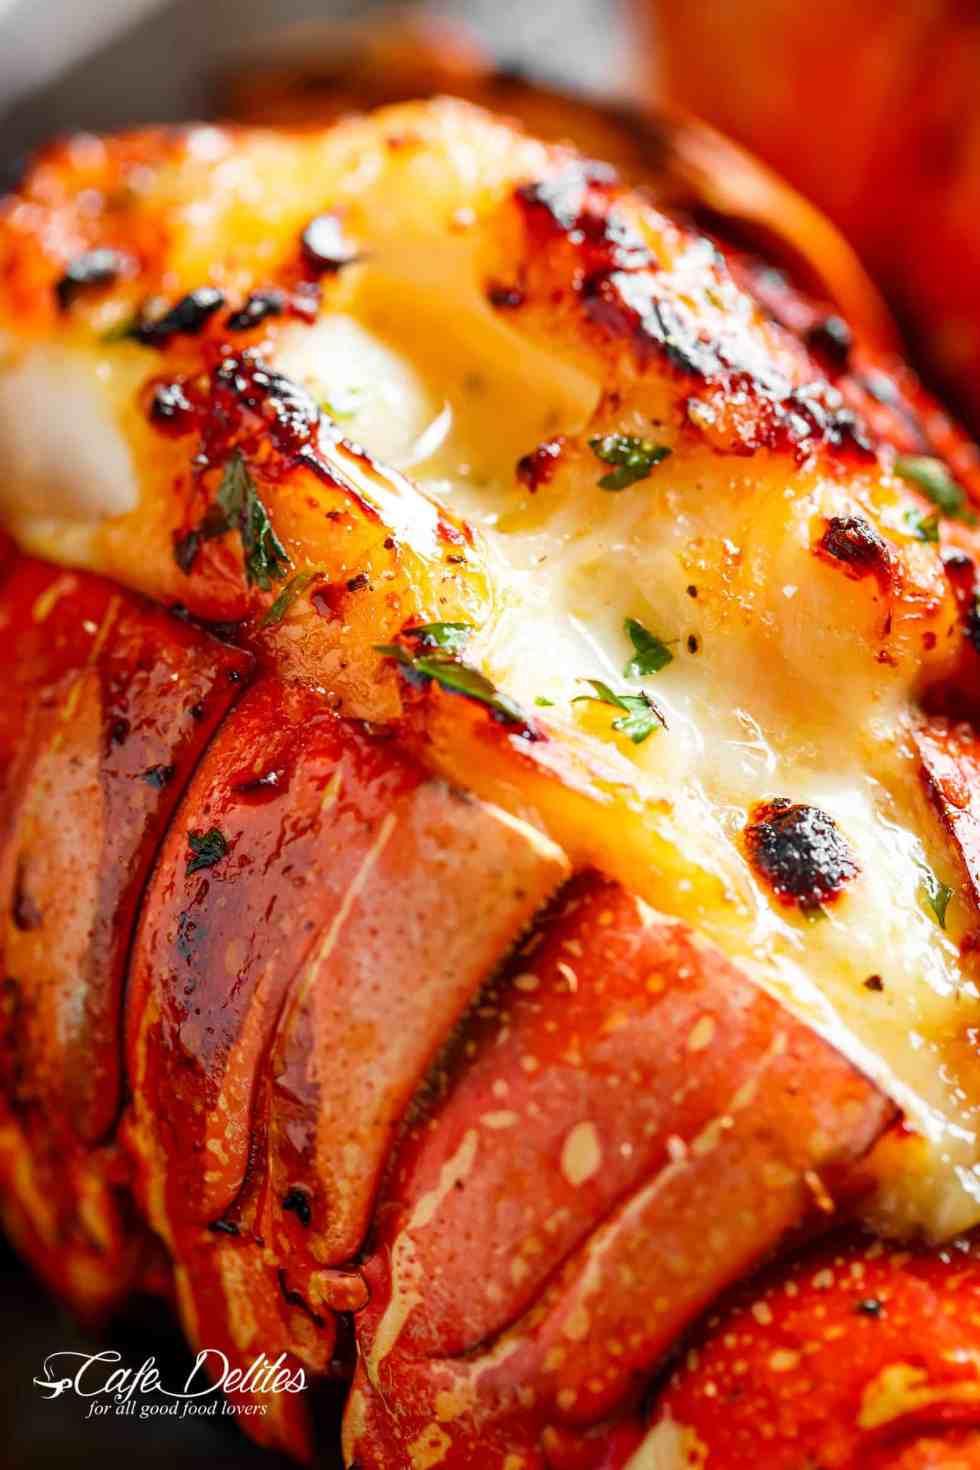 Chef-tasting, slightly charred broiled lobster tails | cafedelites.com